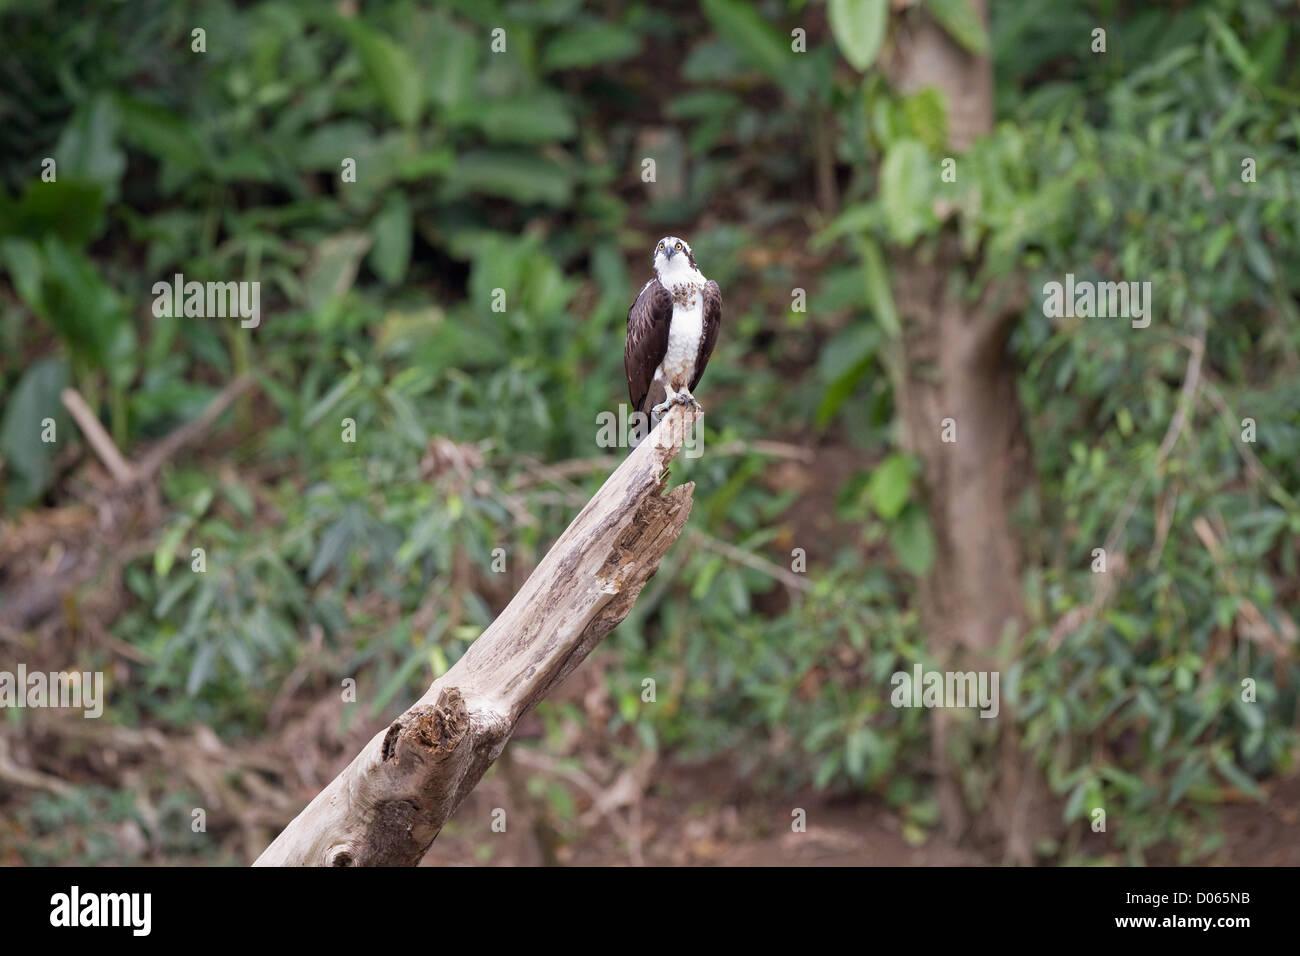 Osprey (Pandion haliaetus) perched on log beside Sarapiqui River, Heredia, Costa Rica. - Stock Image